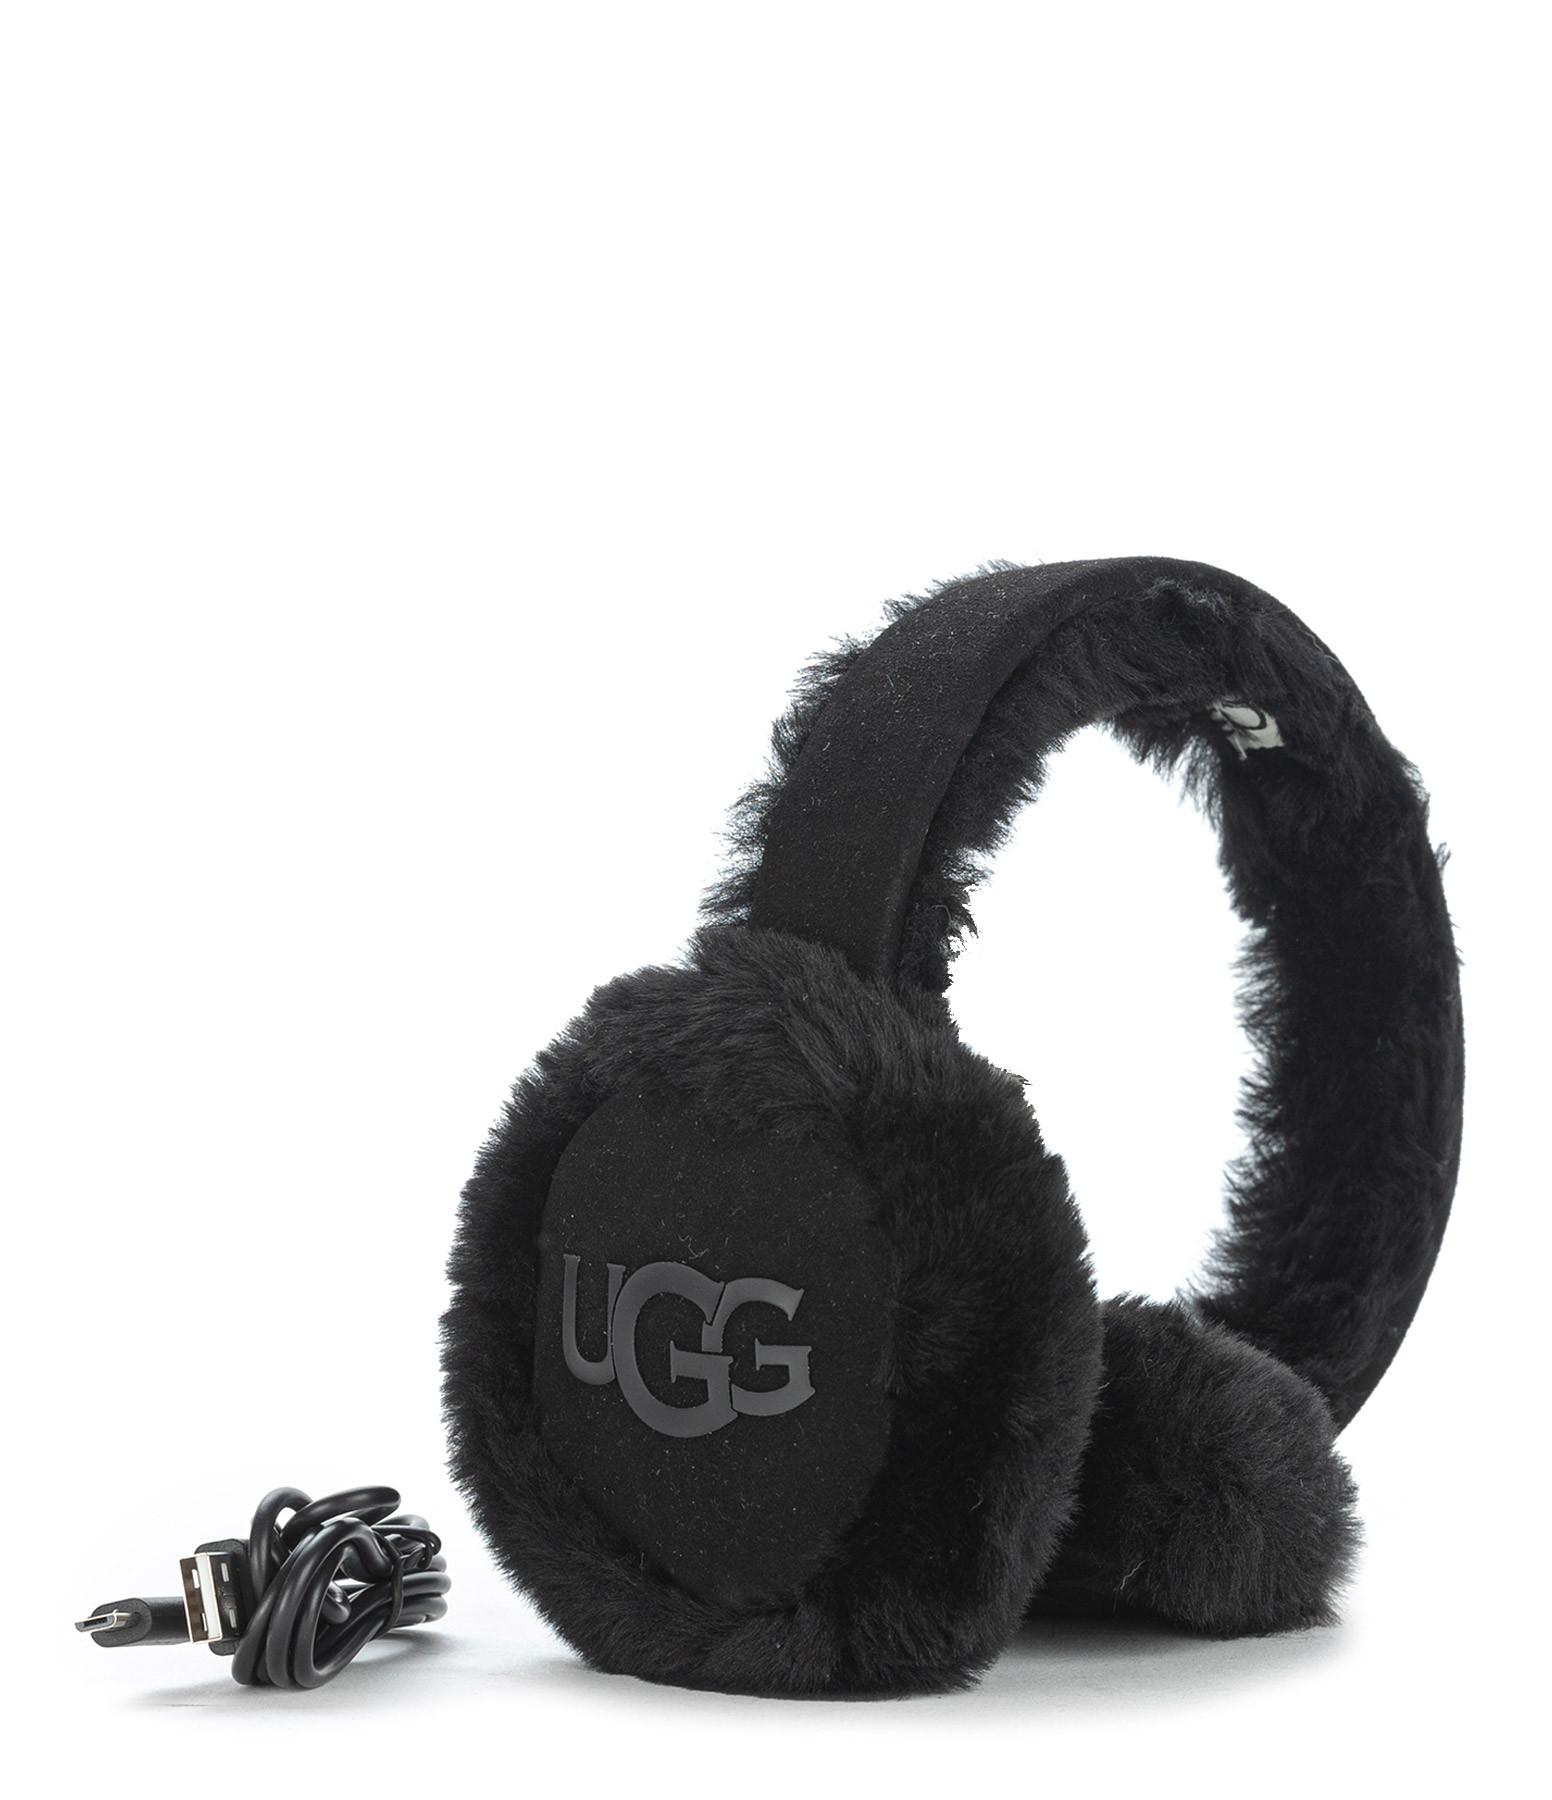 UGG - Cache-Oreilles Audios Bluetooth Noir